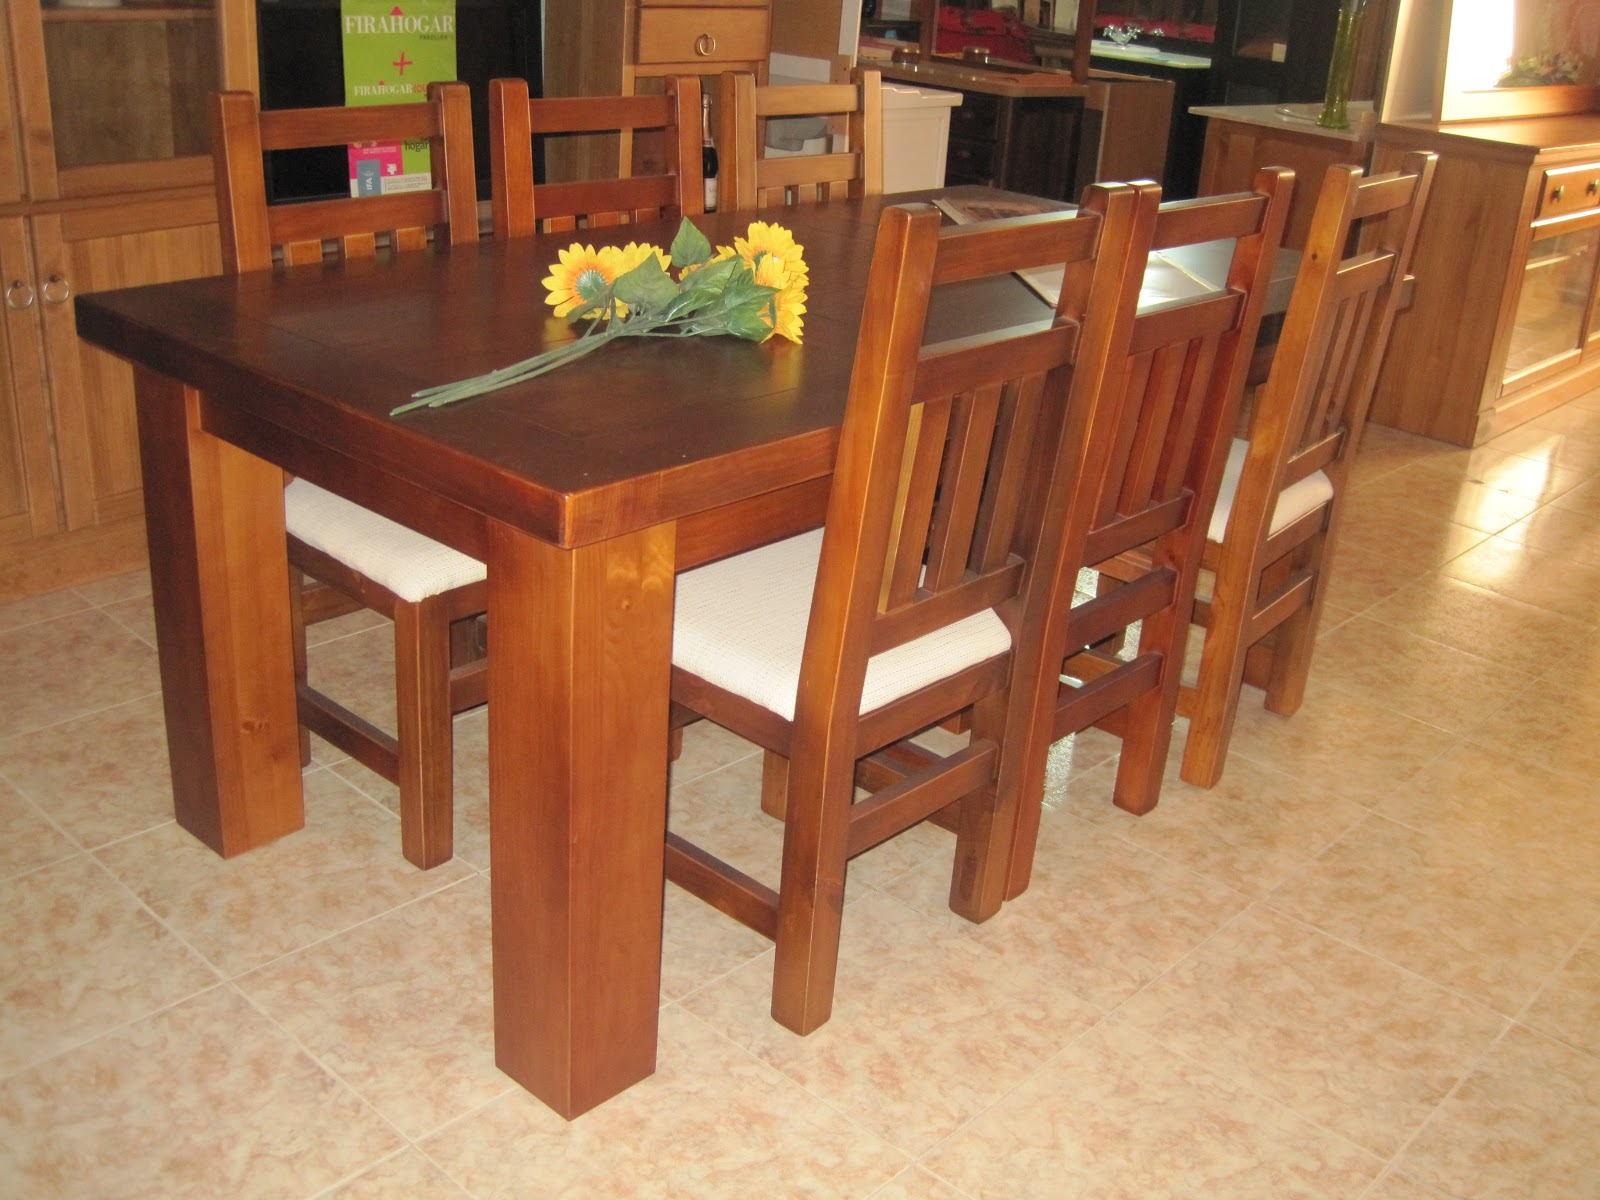 Muebles arcecoll mesas de madera maciza a medida for Muebles madera a medida